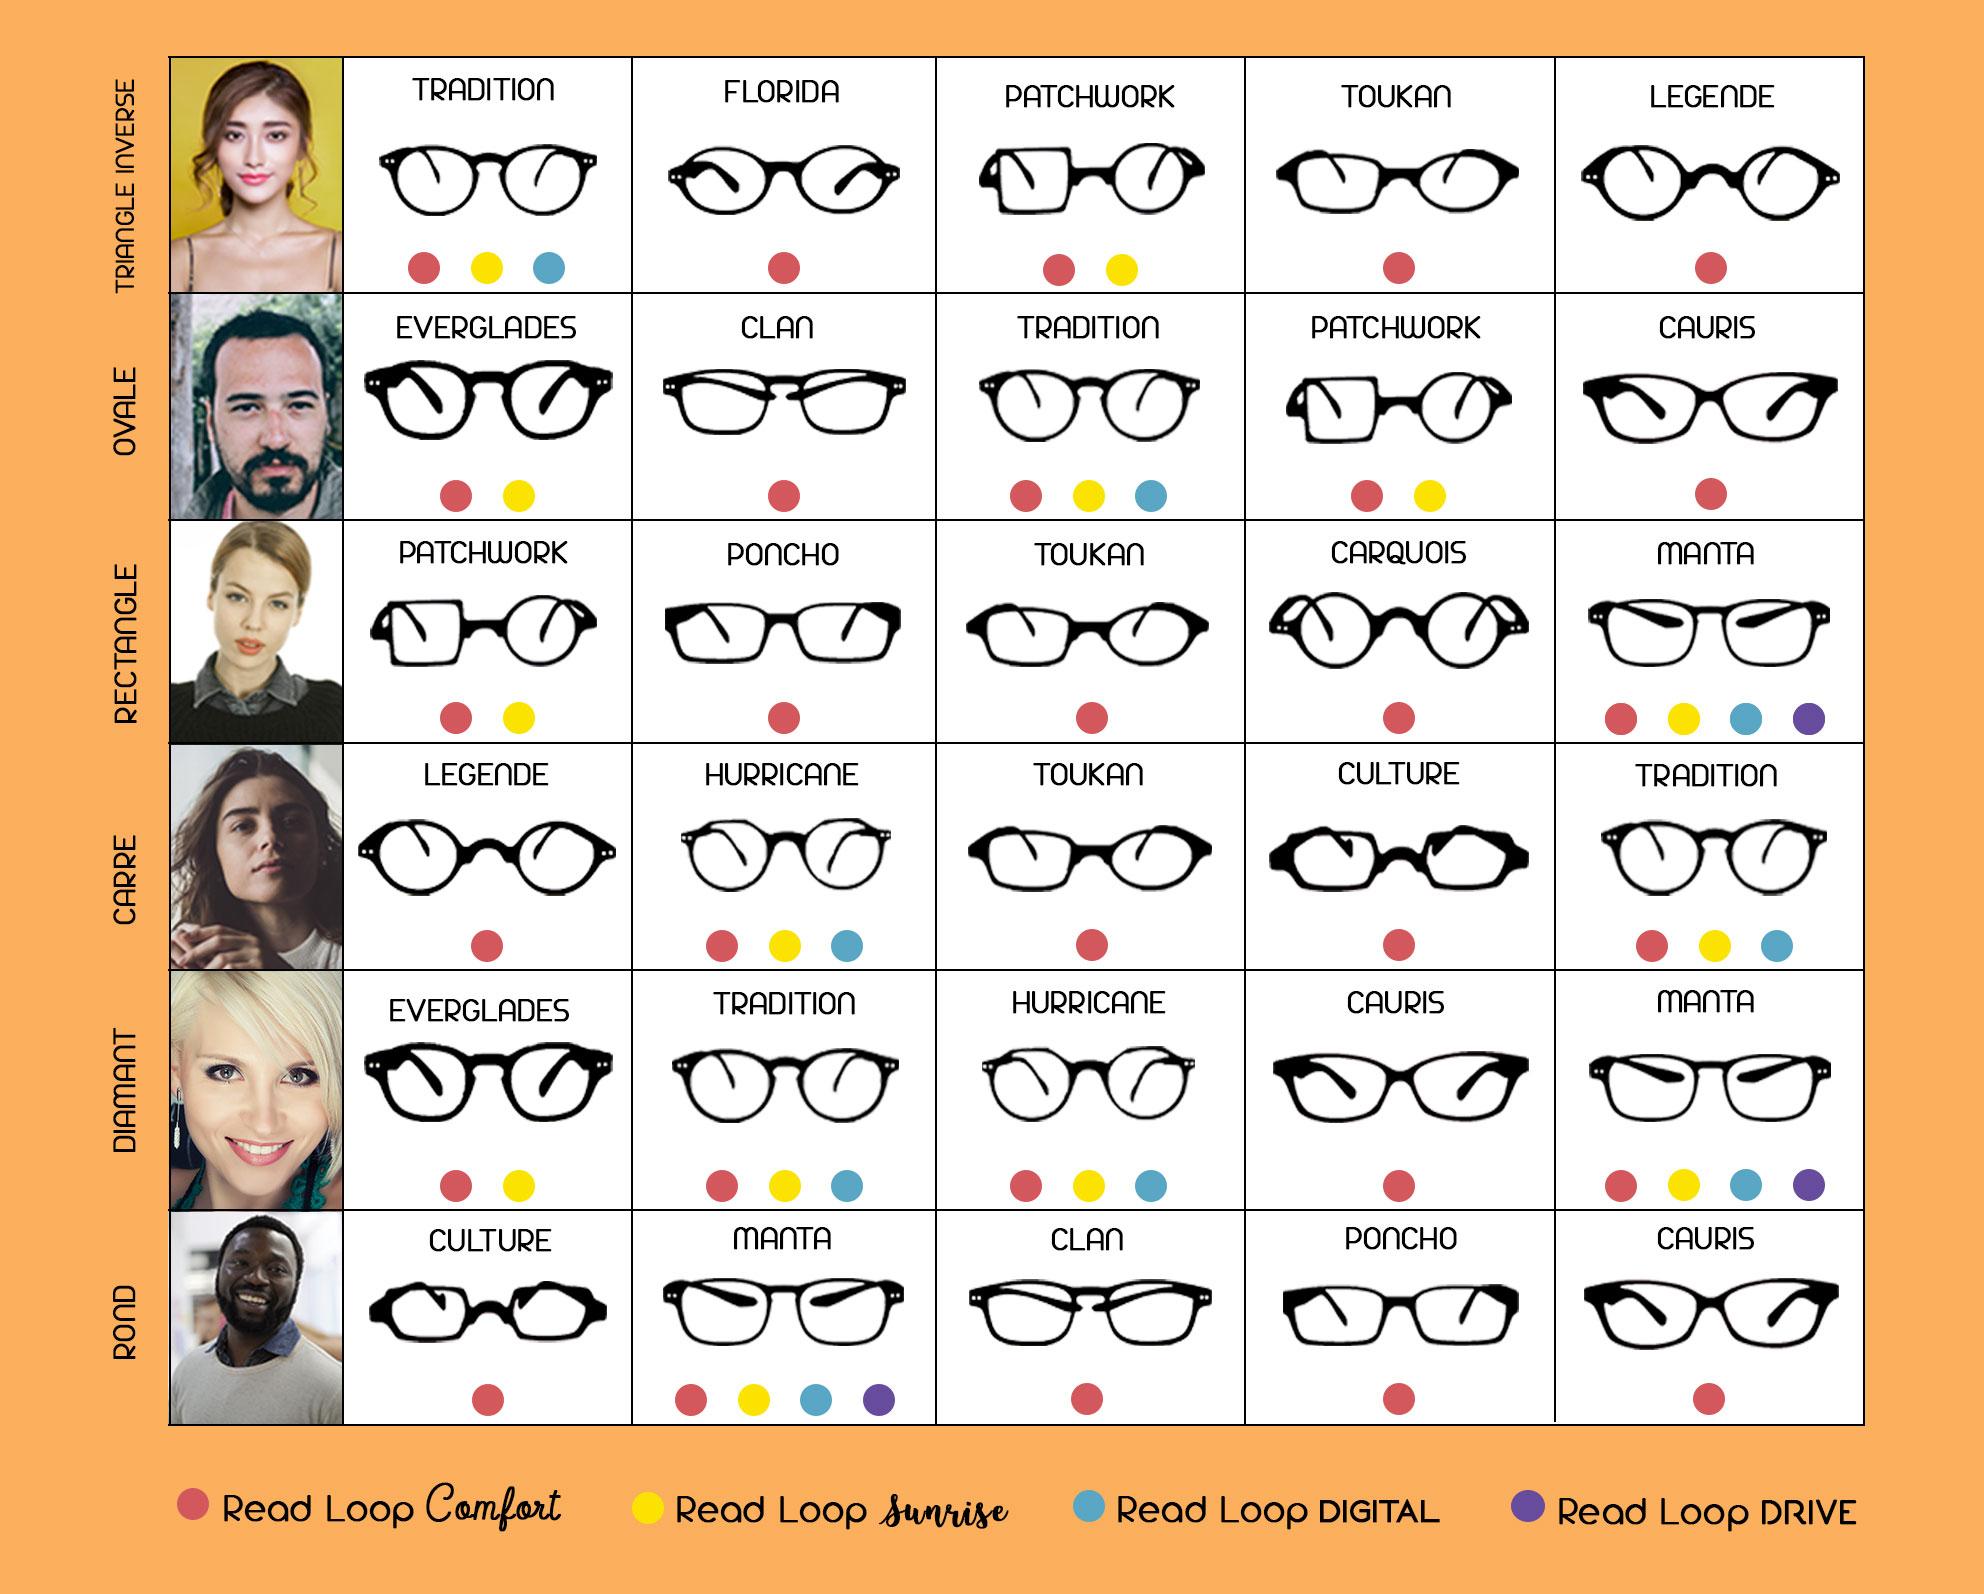 guide comment choisir ses lunettes par read loop. Black Bedroom Furniture Sets. Home Design Ideas